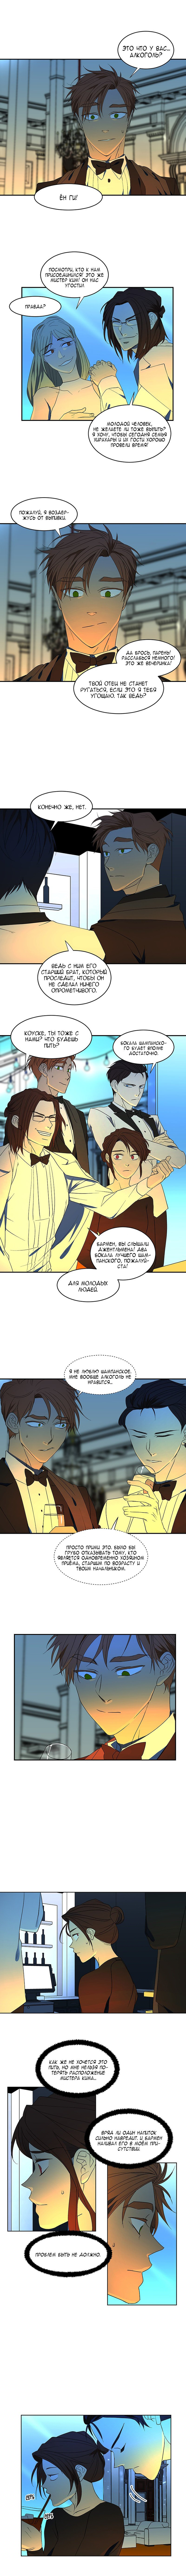 Манга Я люблю Ю / I love Yoo  - Том 1 Глава 58 Страница 2